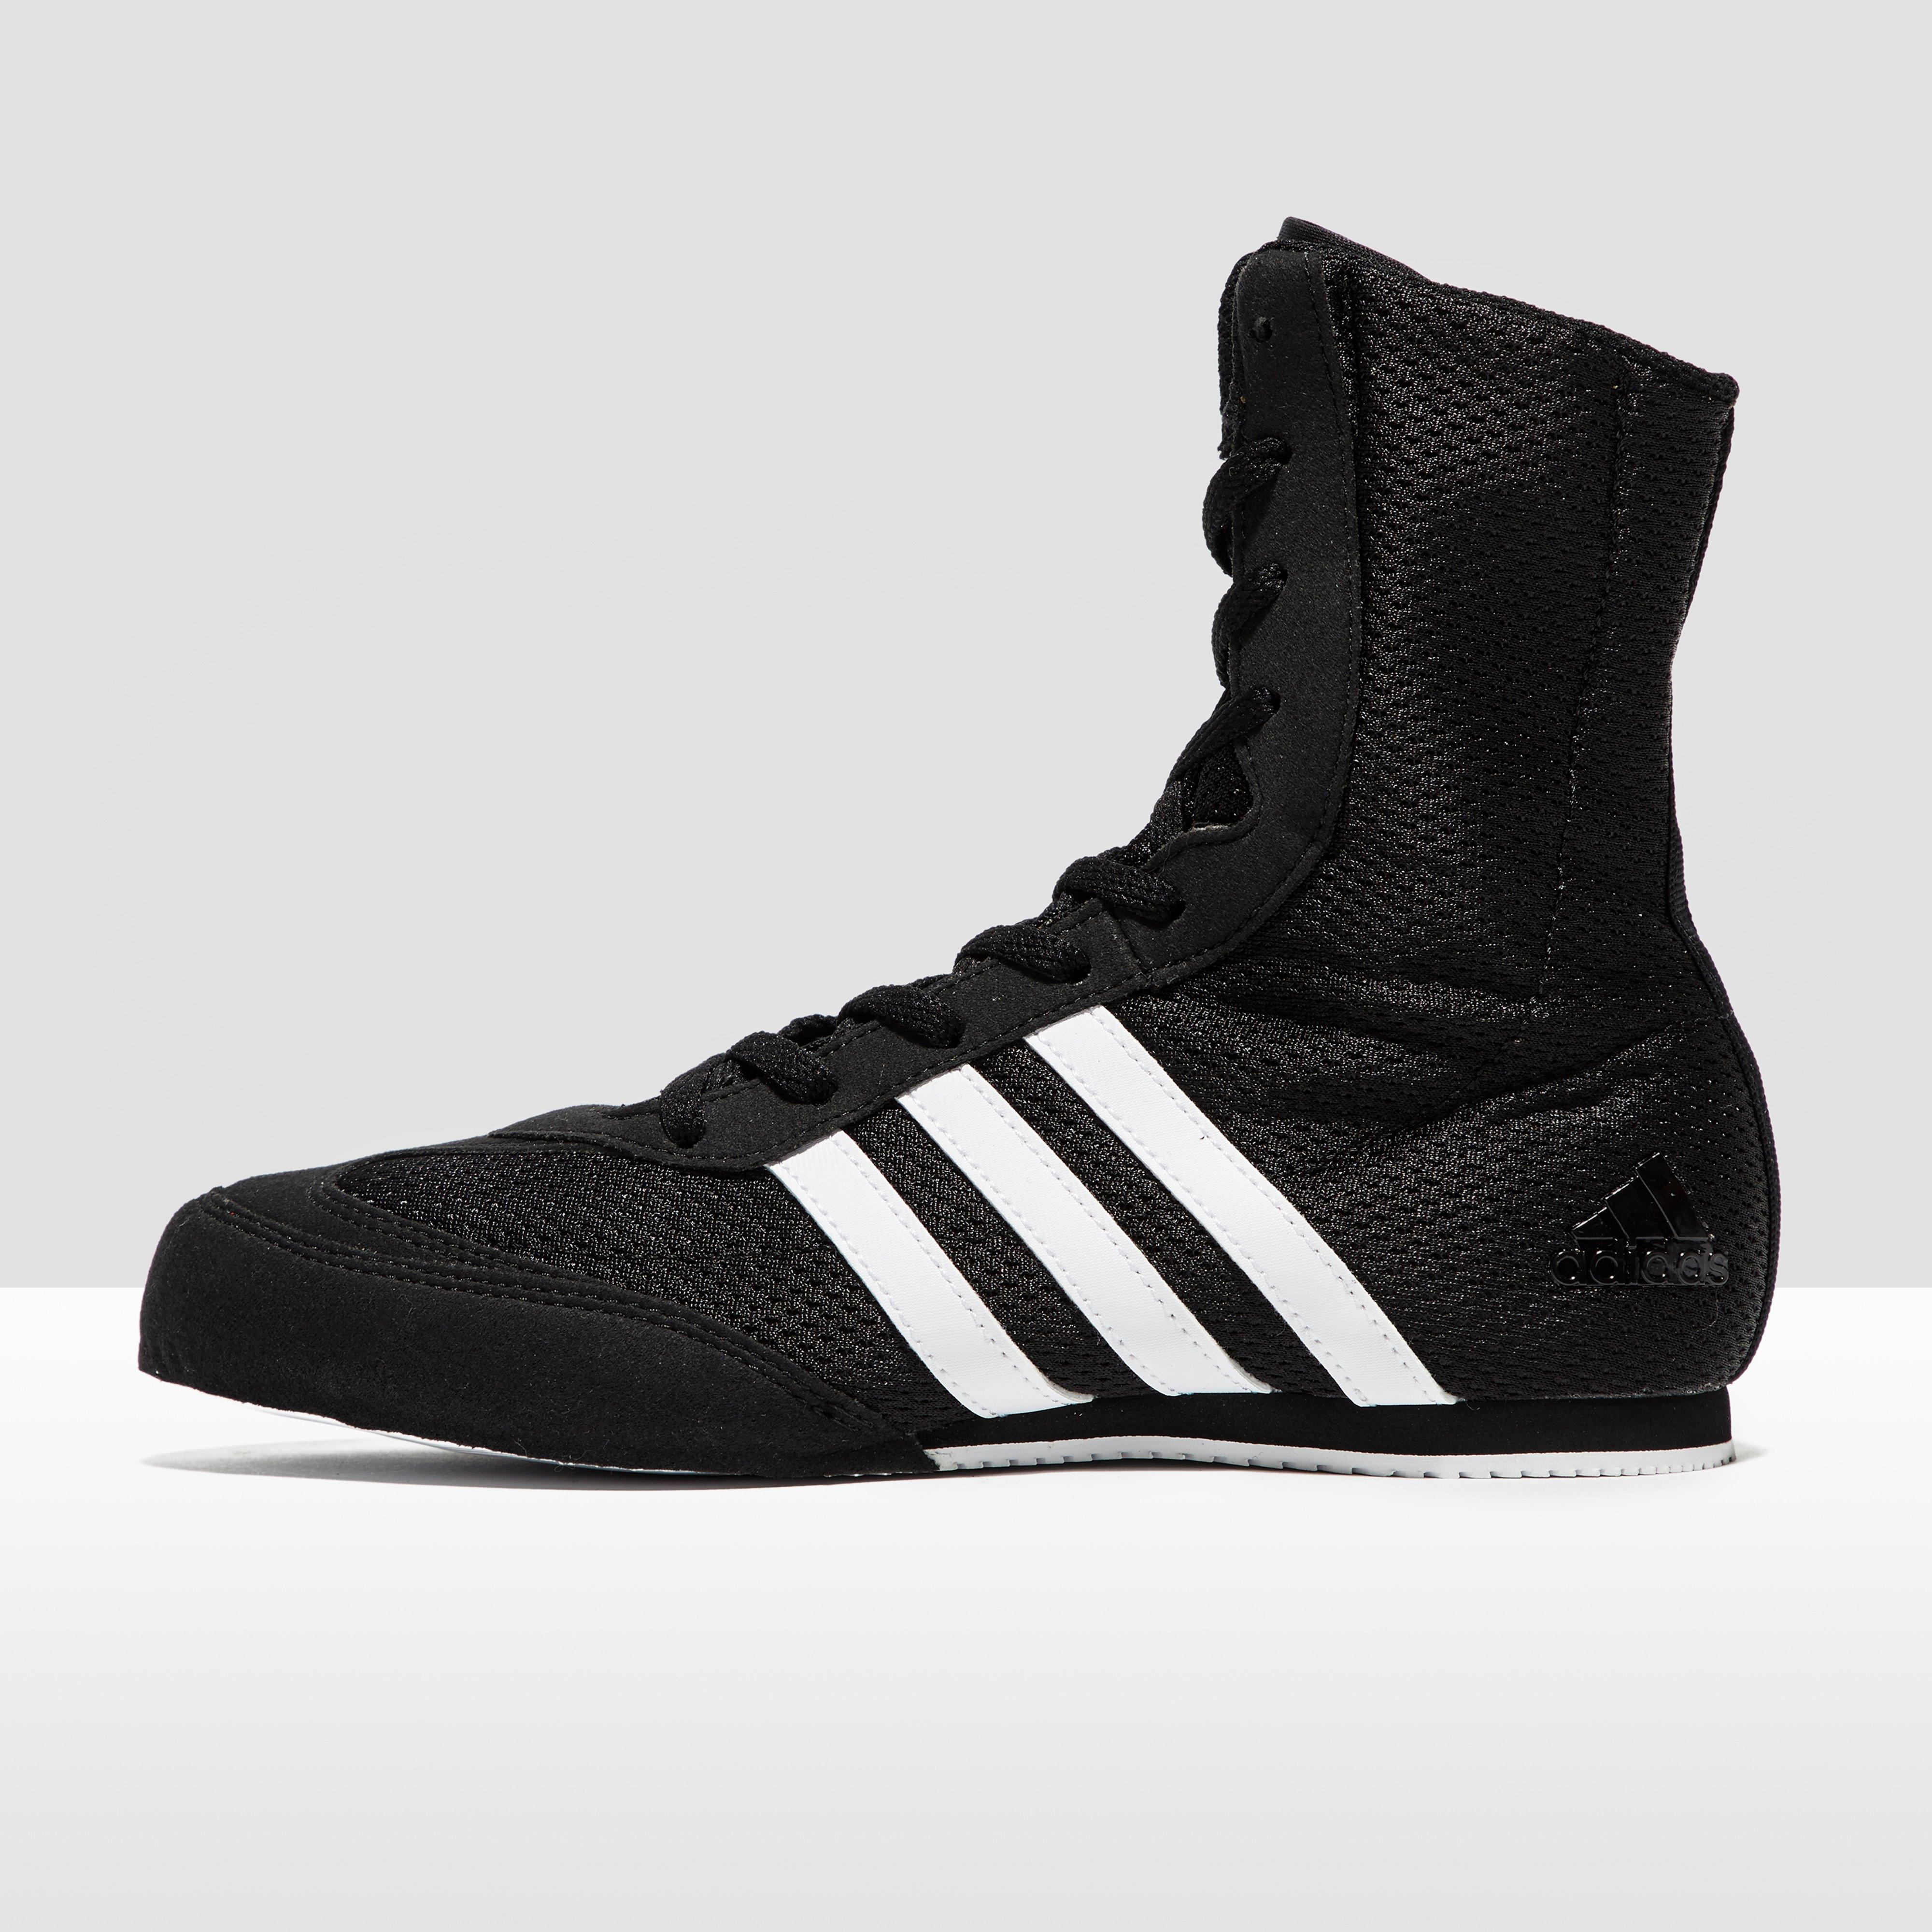 c2f6bbc5c2b73 Details about adidas Box Hog 2 Junior Boxing Boots